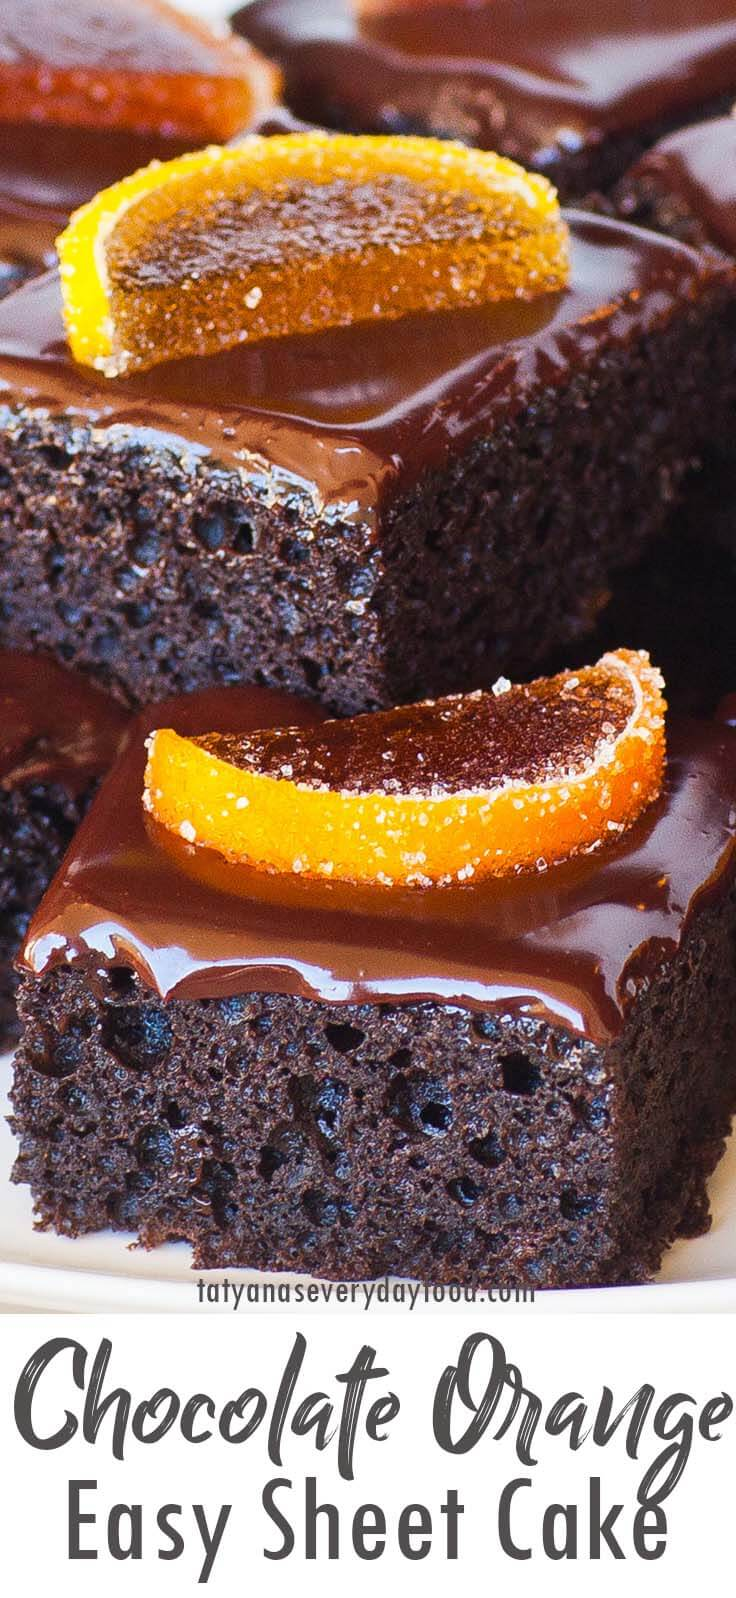 Chocolate Orange Sheet Cake recipe